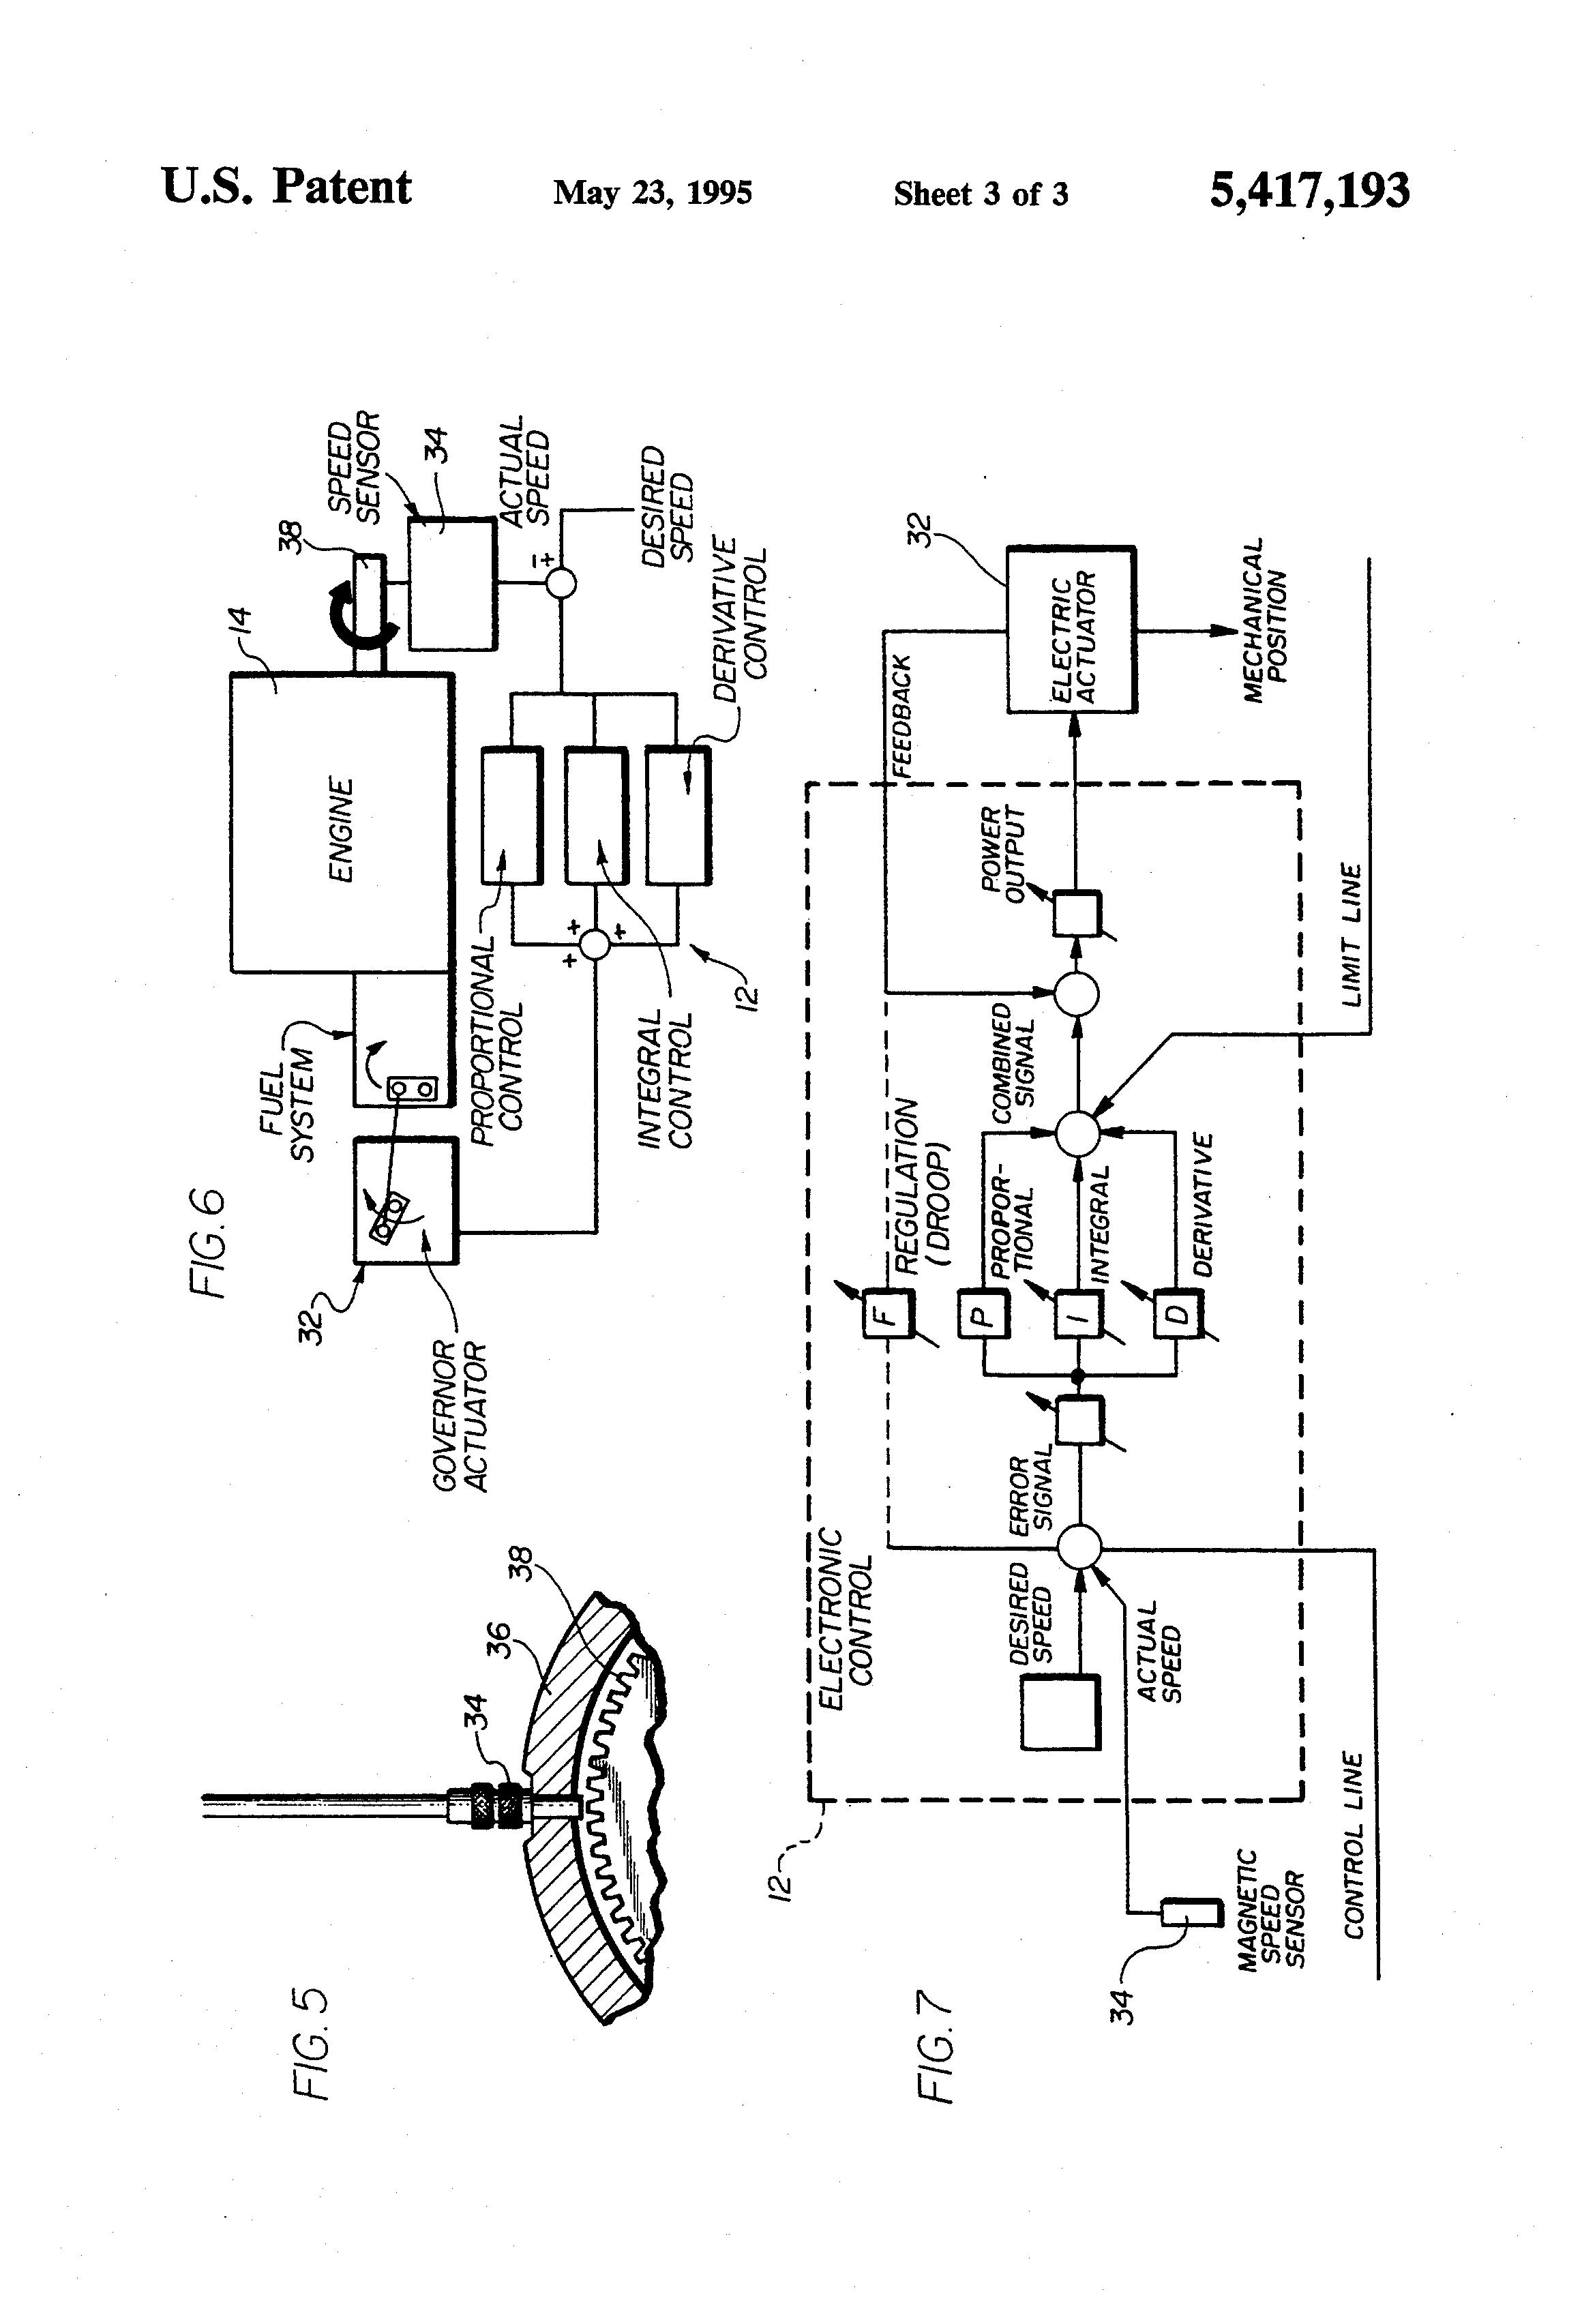 1974 Cushman Truckster Wiring Diagram